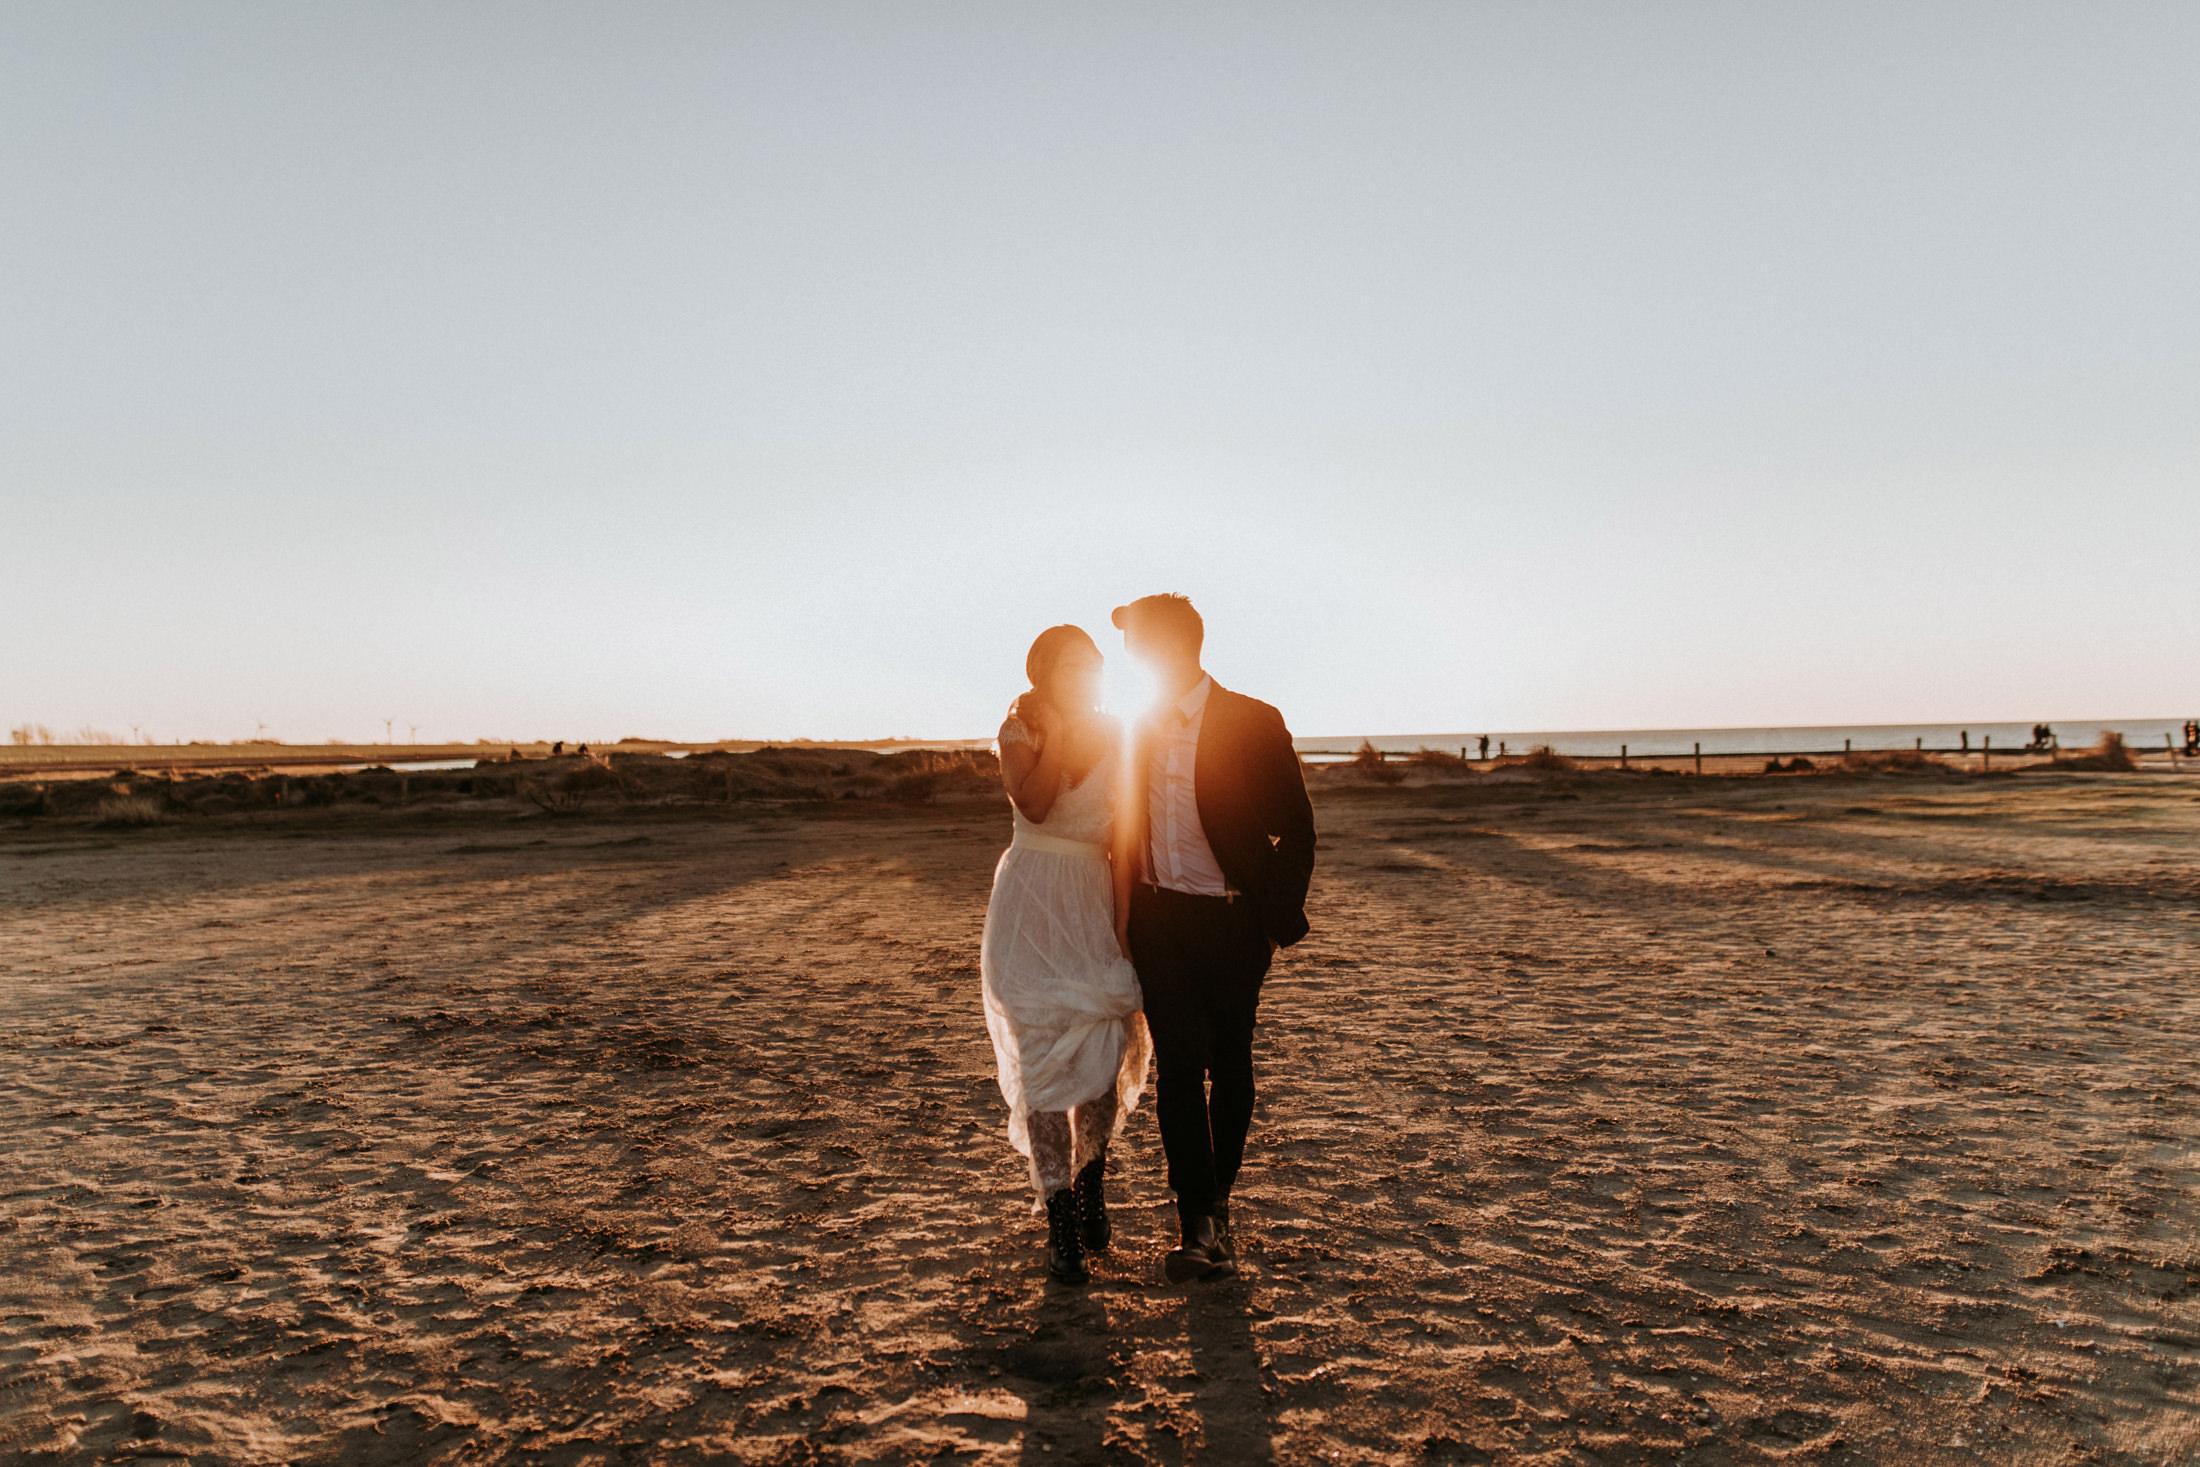 Wedding_Photographer_Mallorca_Daniela-Marquardt_Photography_CanaryIslands_Lanzarote_Iceland_Tuskany_Santorini_Portugal_Schweiz_Austria_Bayern_Elopement_Hochzeitsfotograf_Norddeichich_74